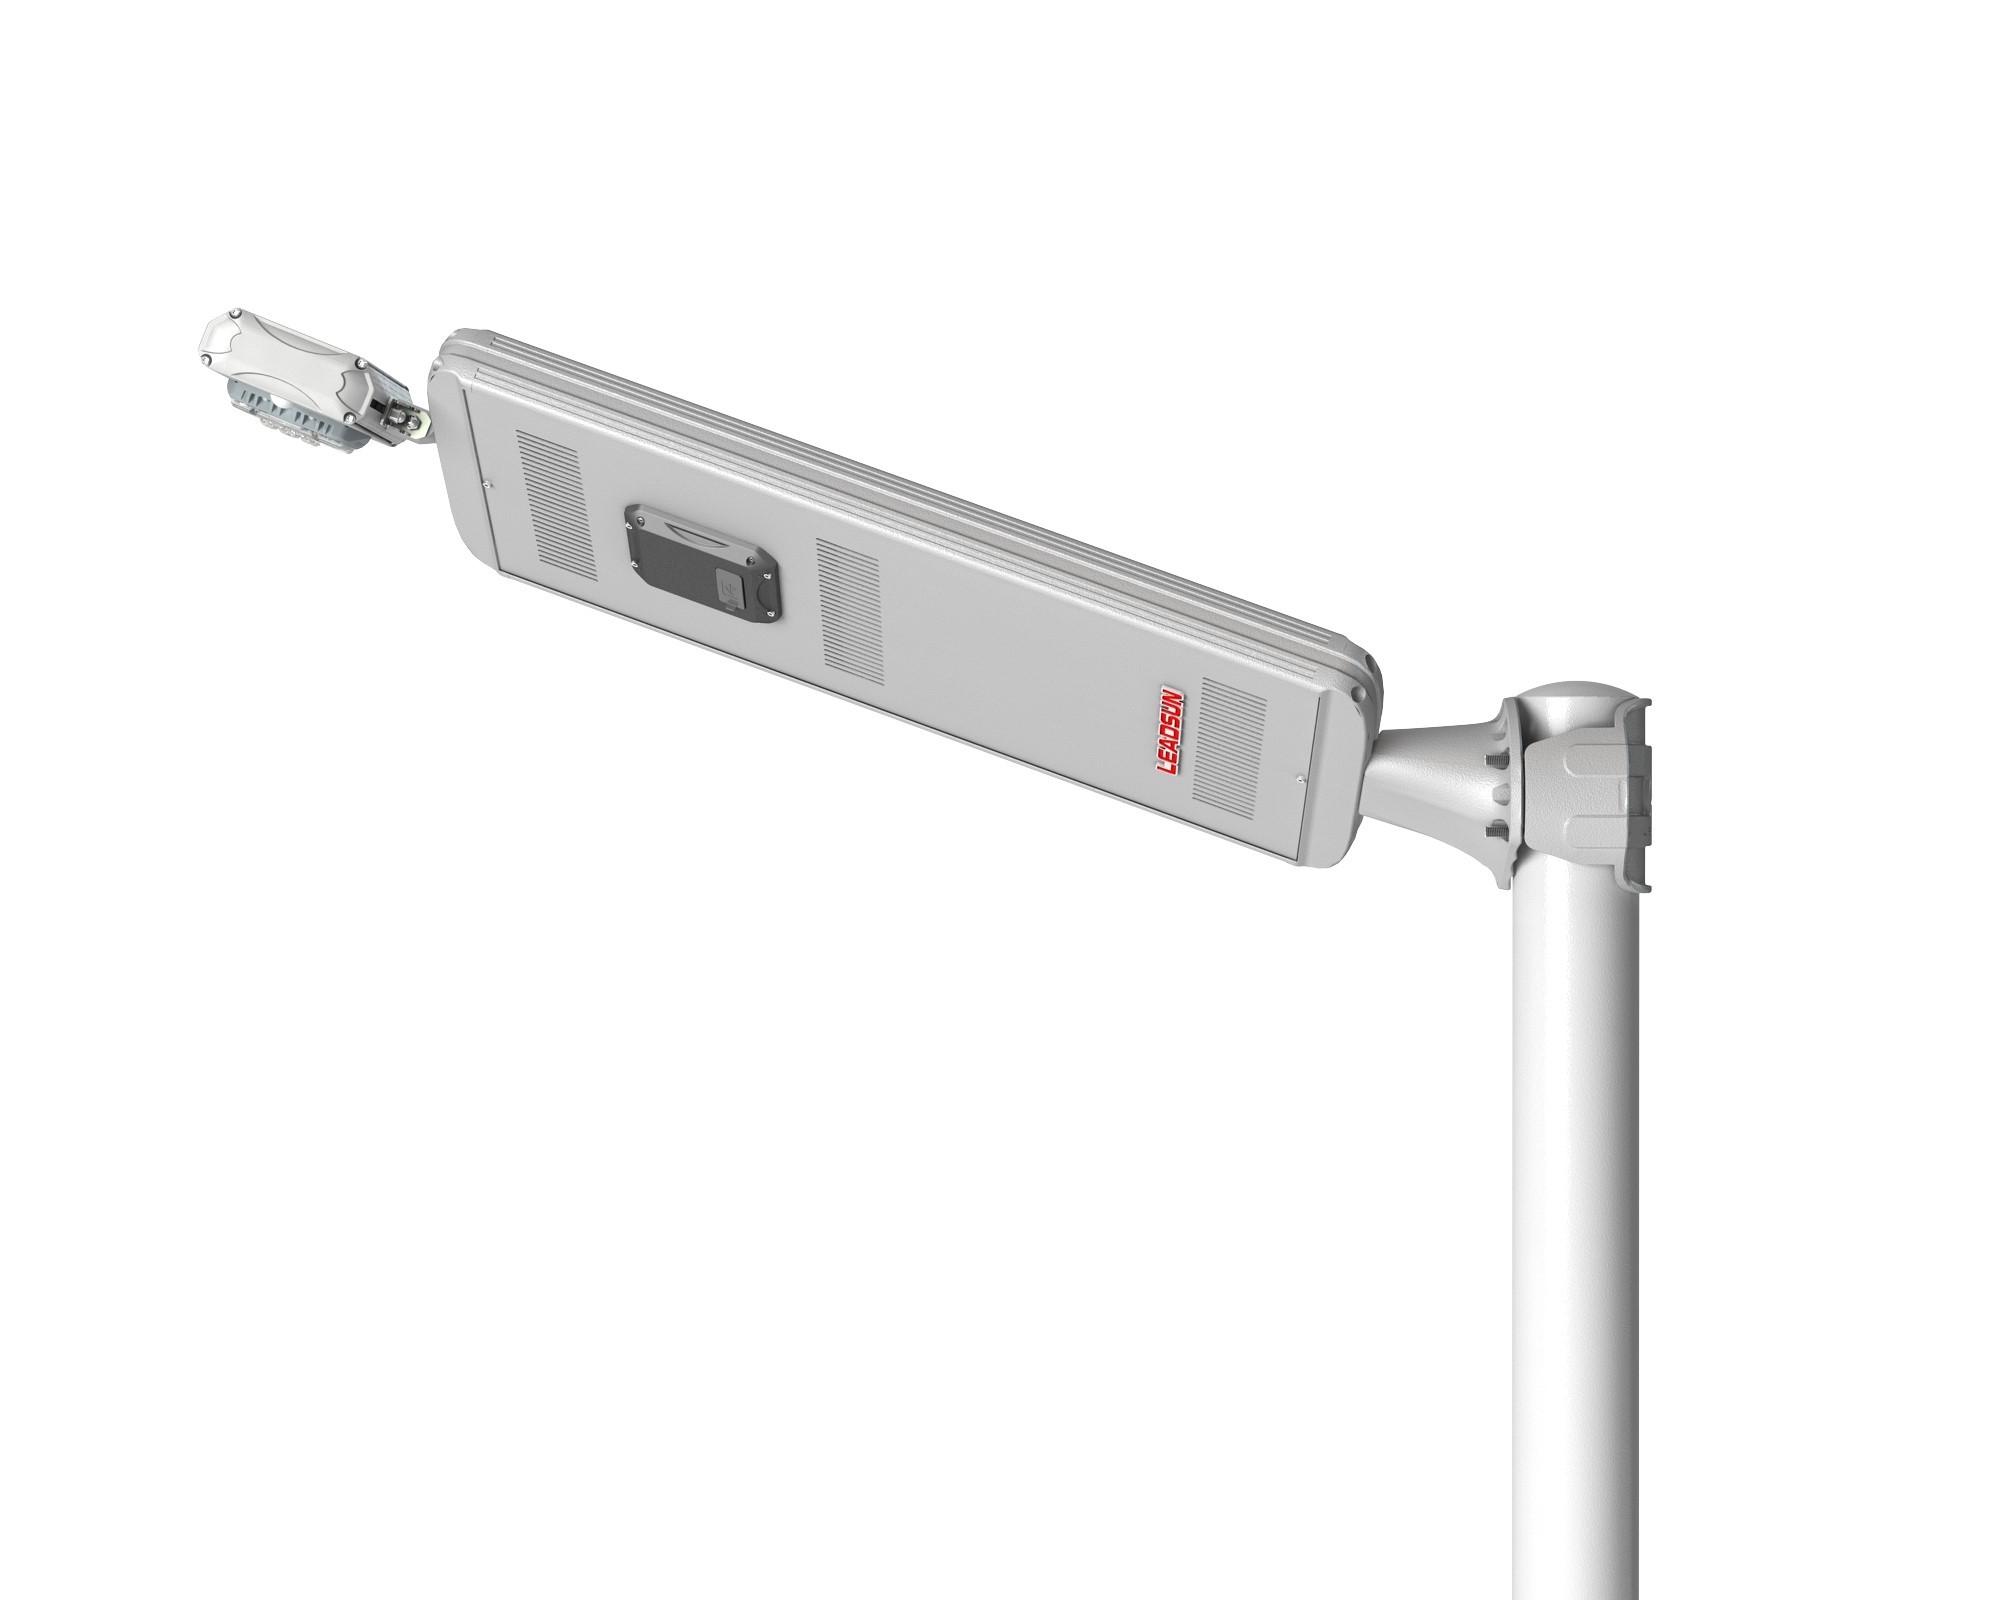 HC824ASR3010IMC - Solar Street Light AE2 Swivel Type, 30W PV, 10W Cree LED